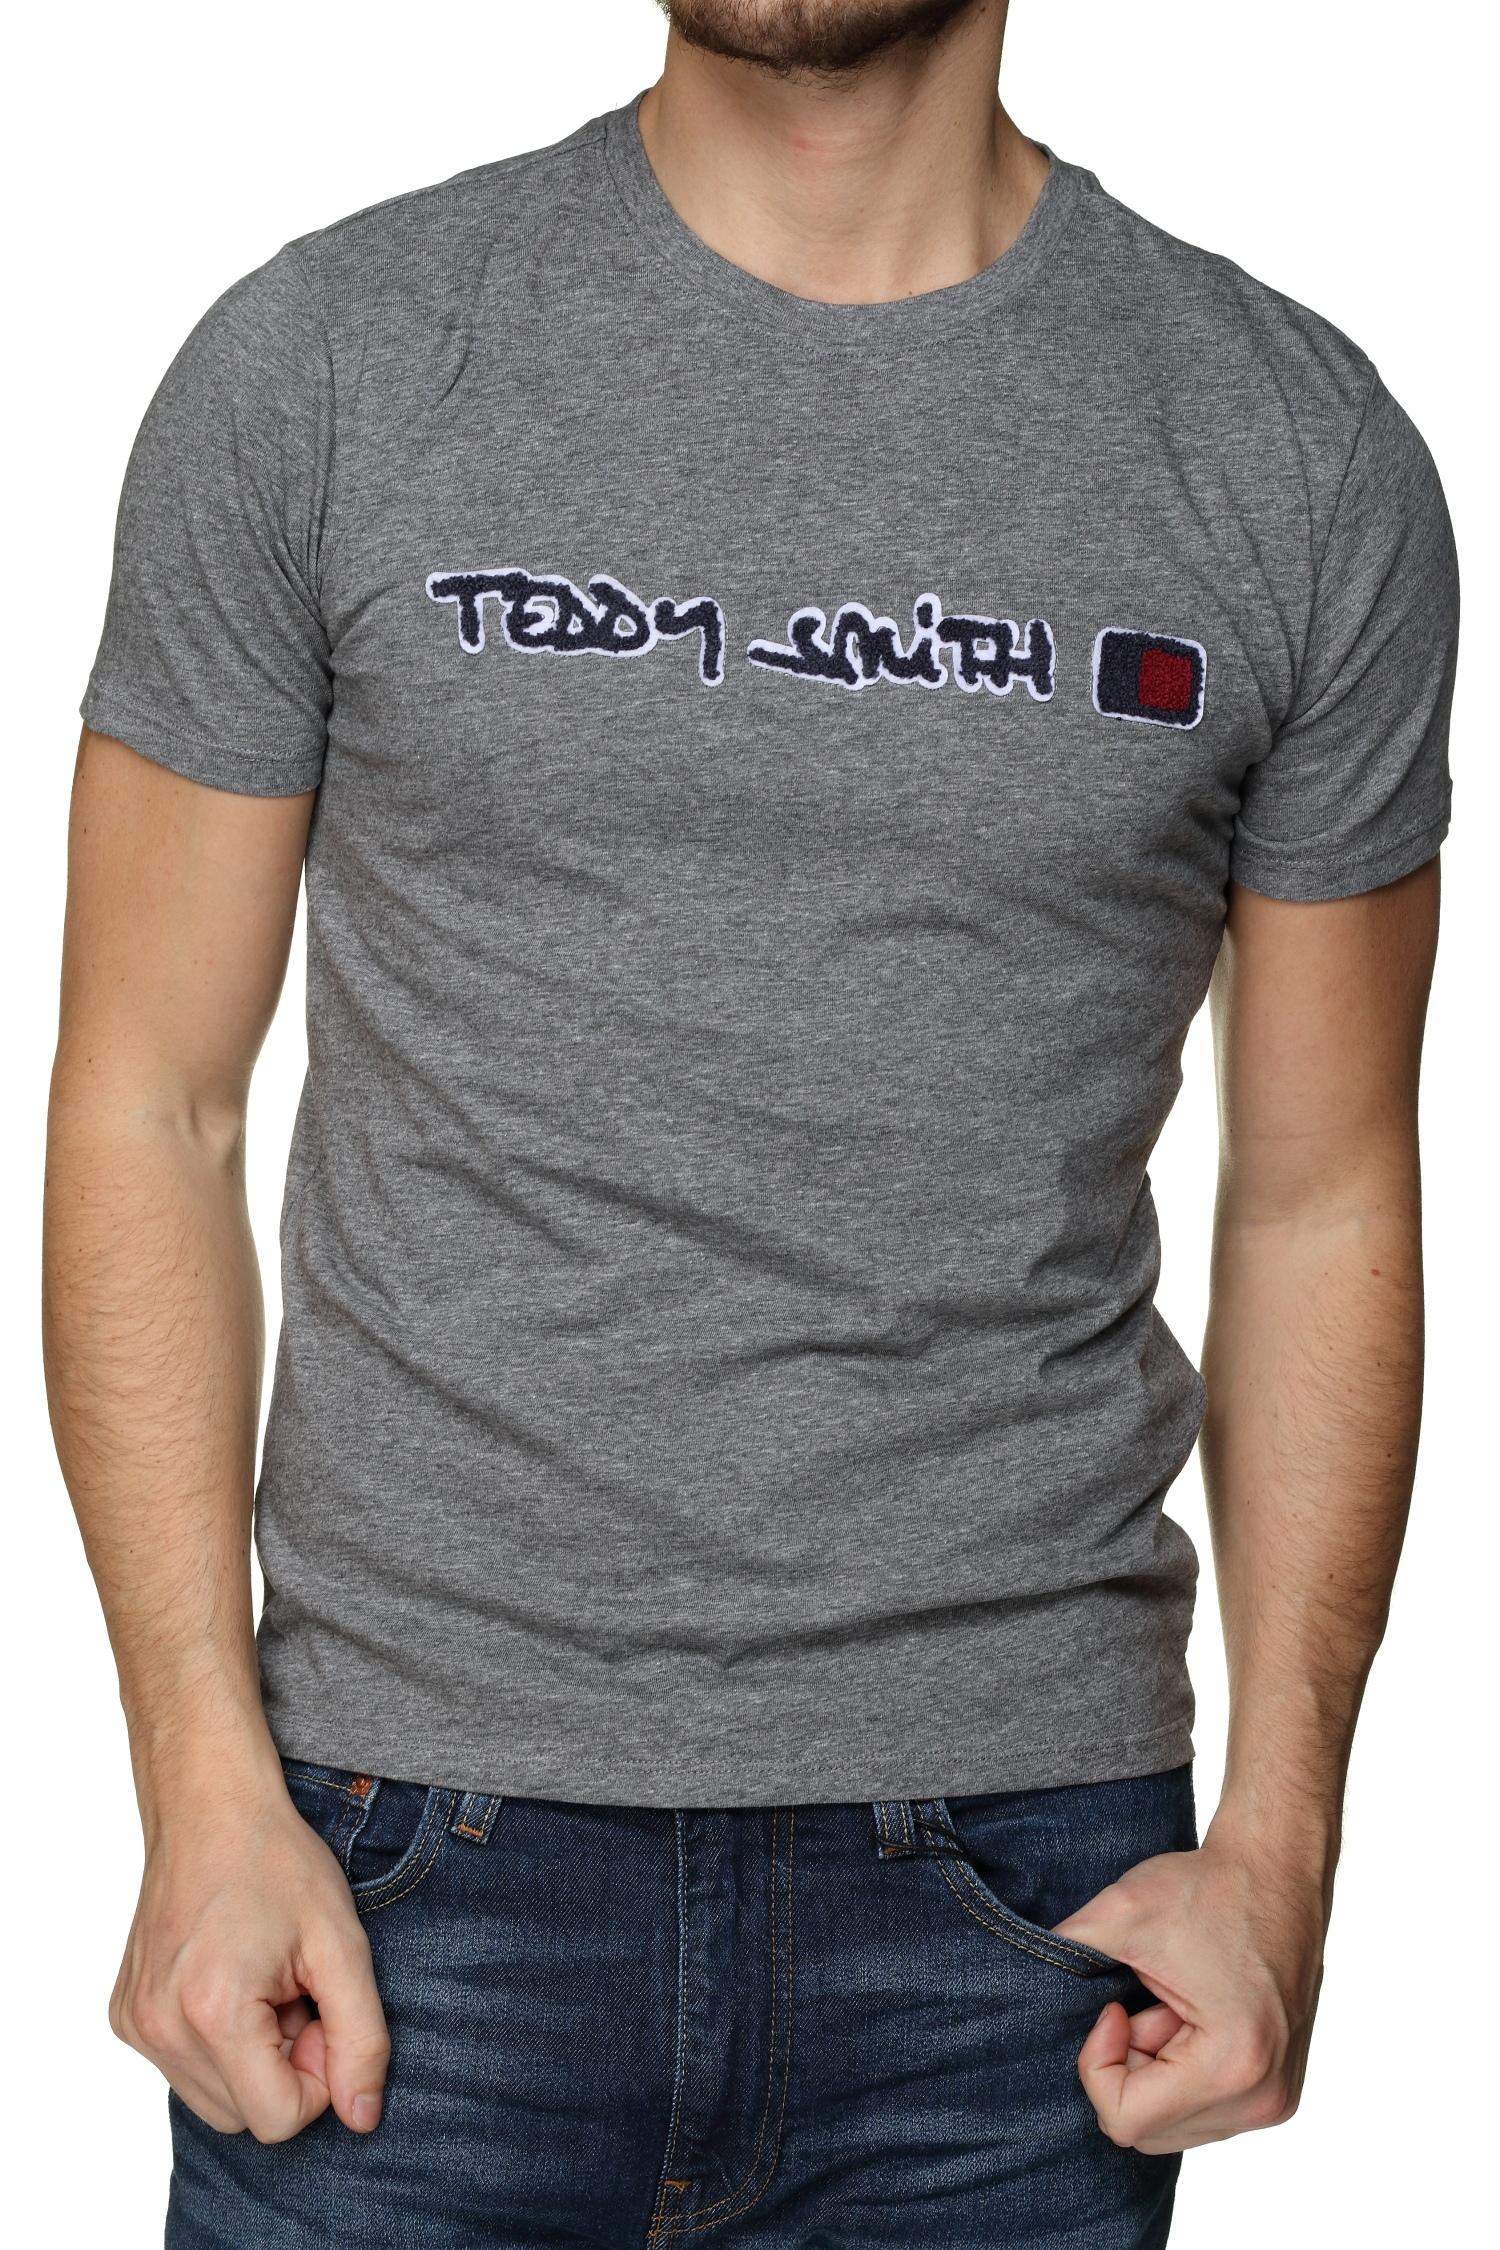 https://www.leadermode.com/196302/teddy-smith-t-clap-mc-11014740d-149-gris-chine.jpg